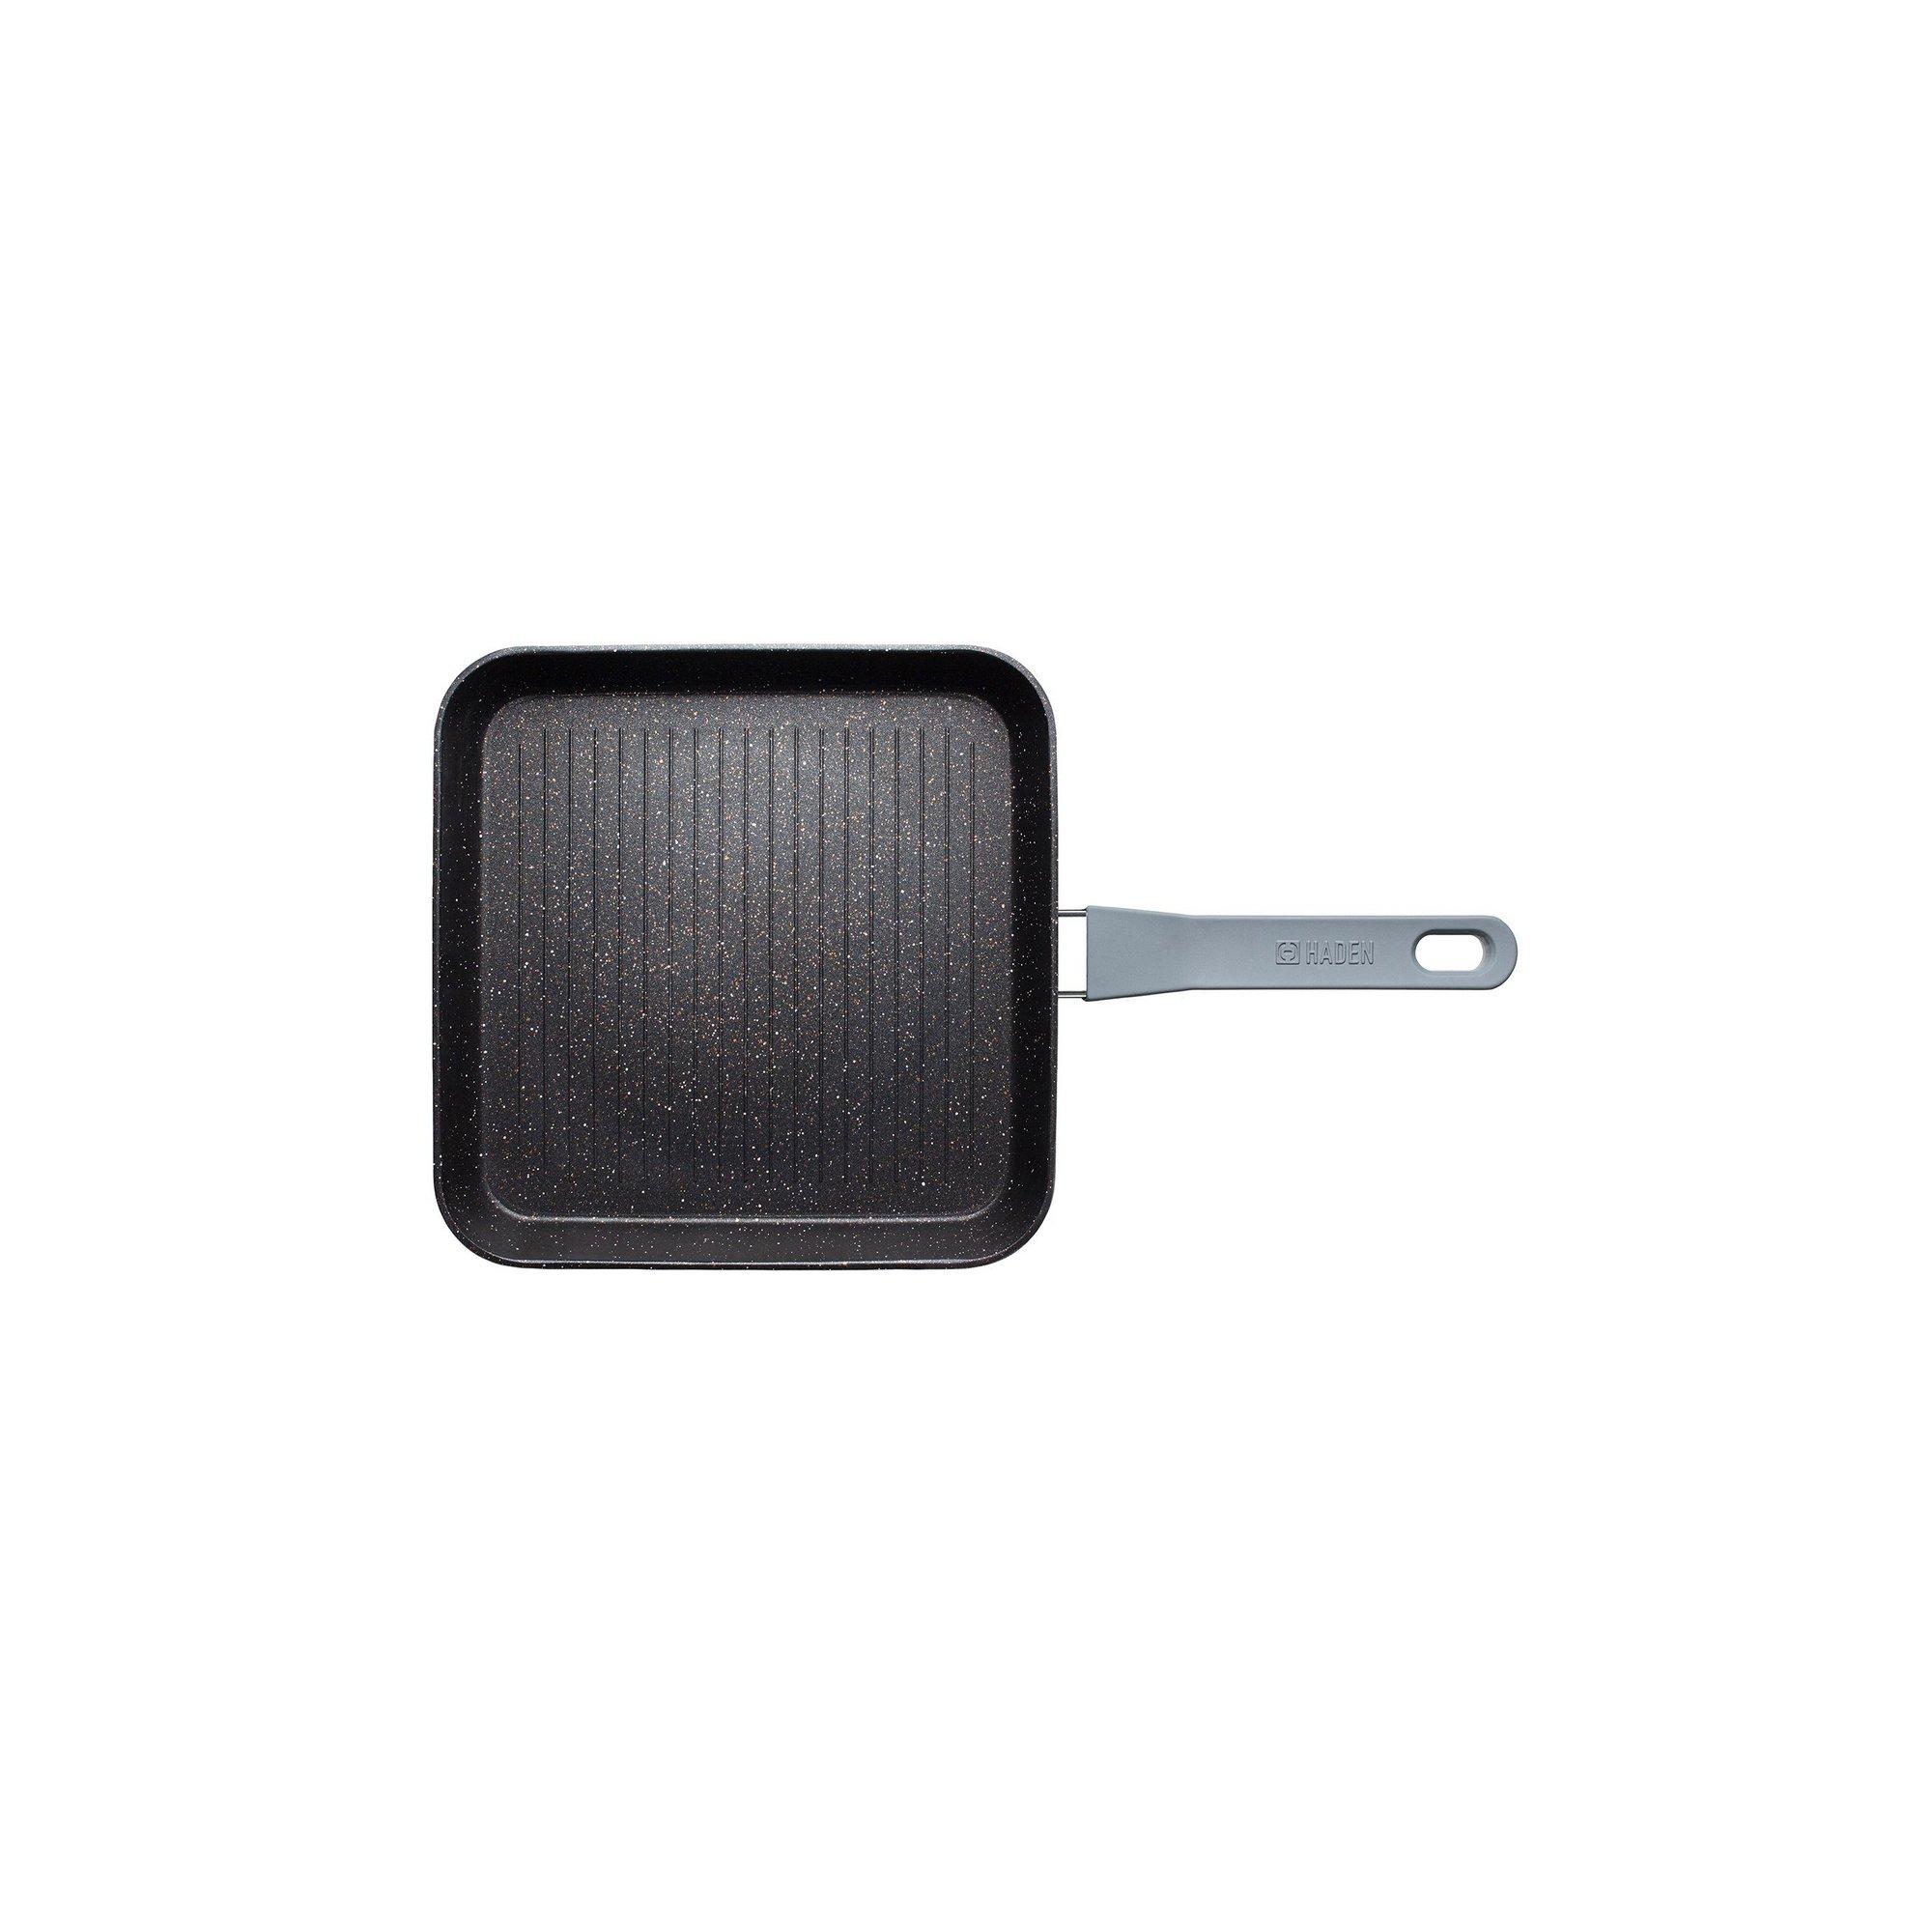 Image of Haden Goldstone Forged Aluminium 28cm Grill Pan